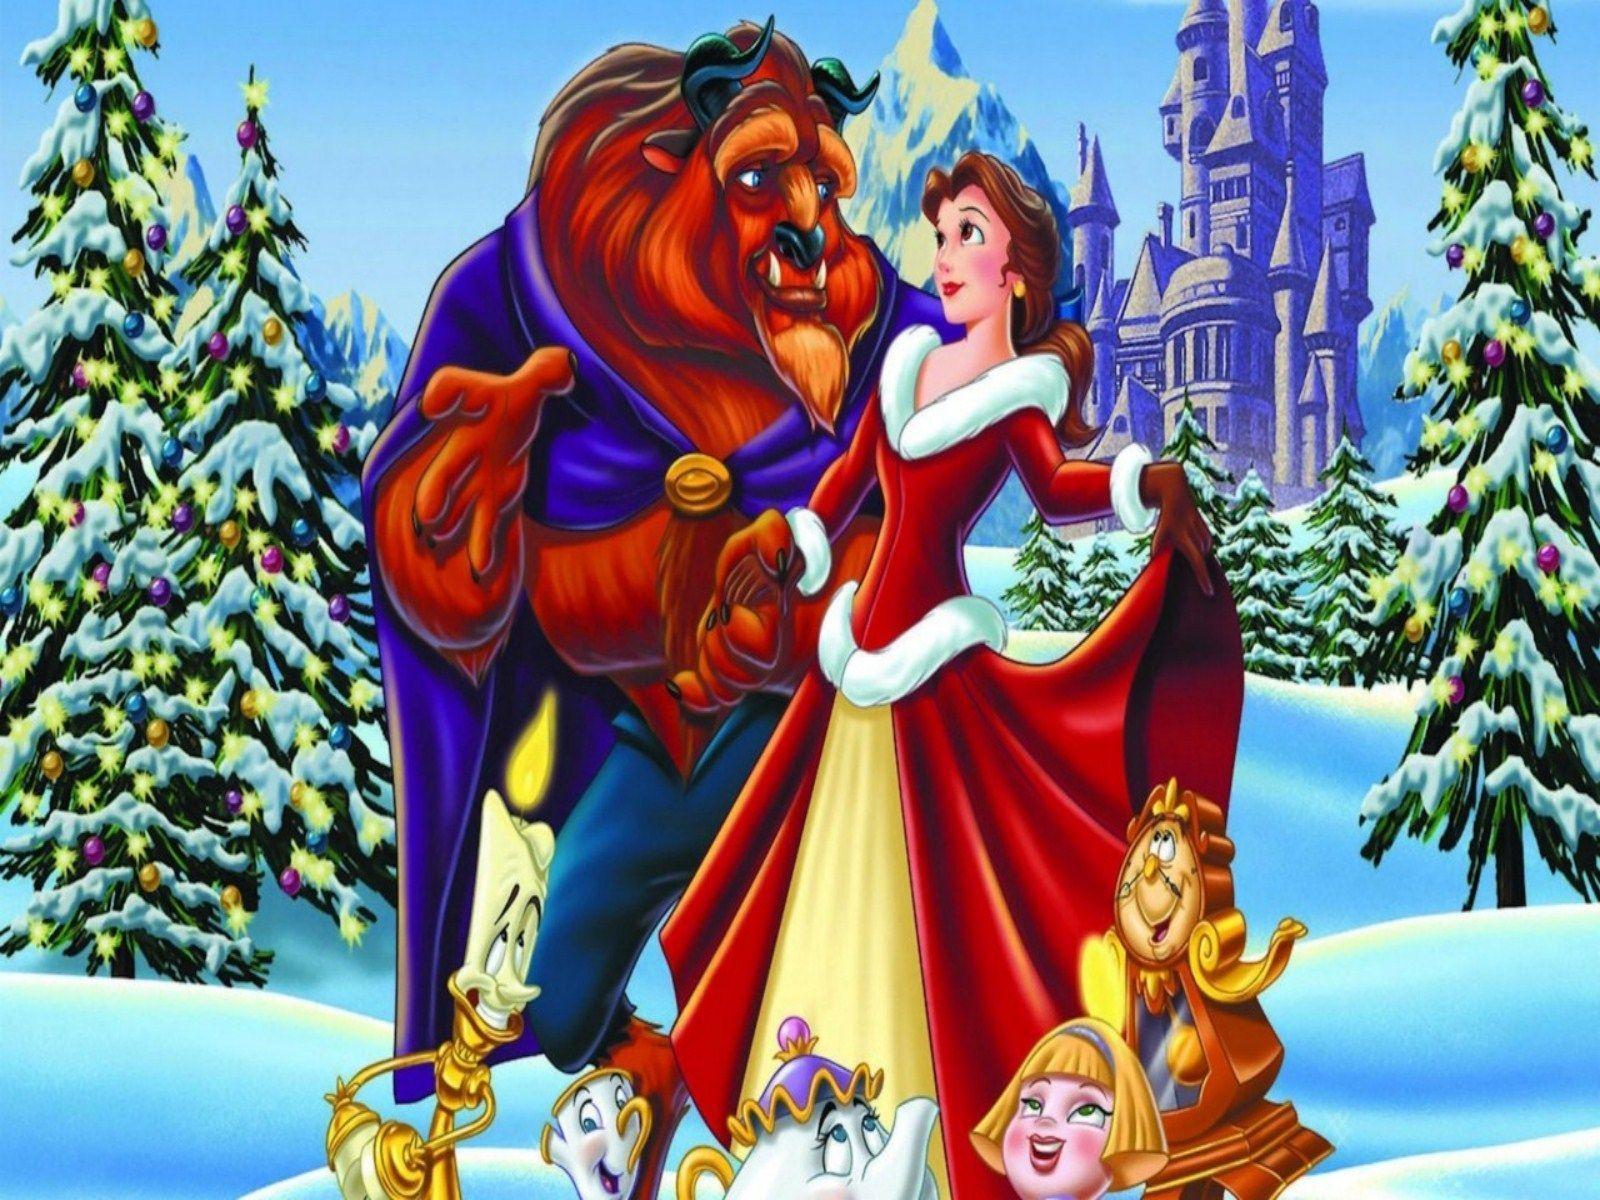 Disney Christmas Wallpapers Desktop - Wallpaper Cave